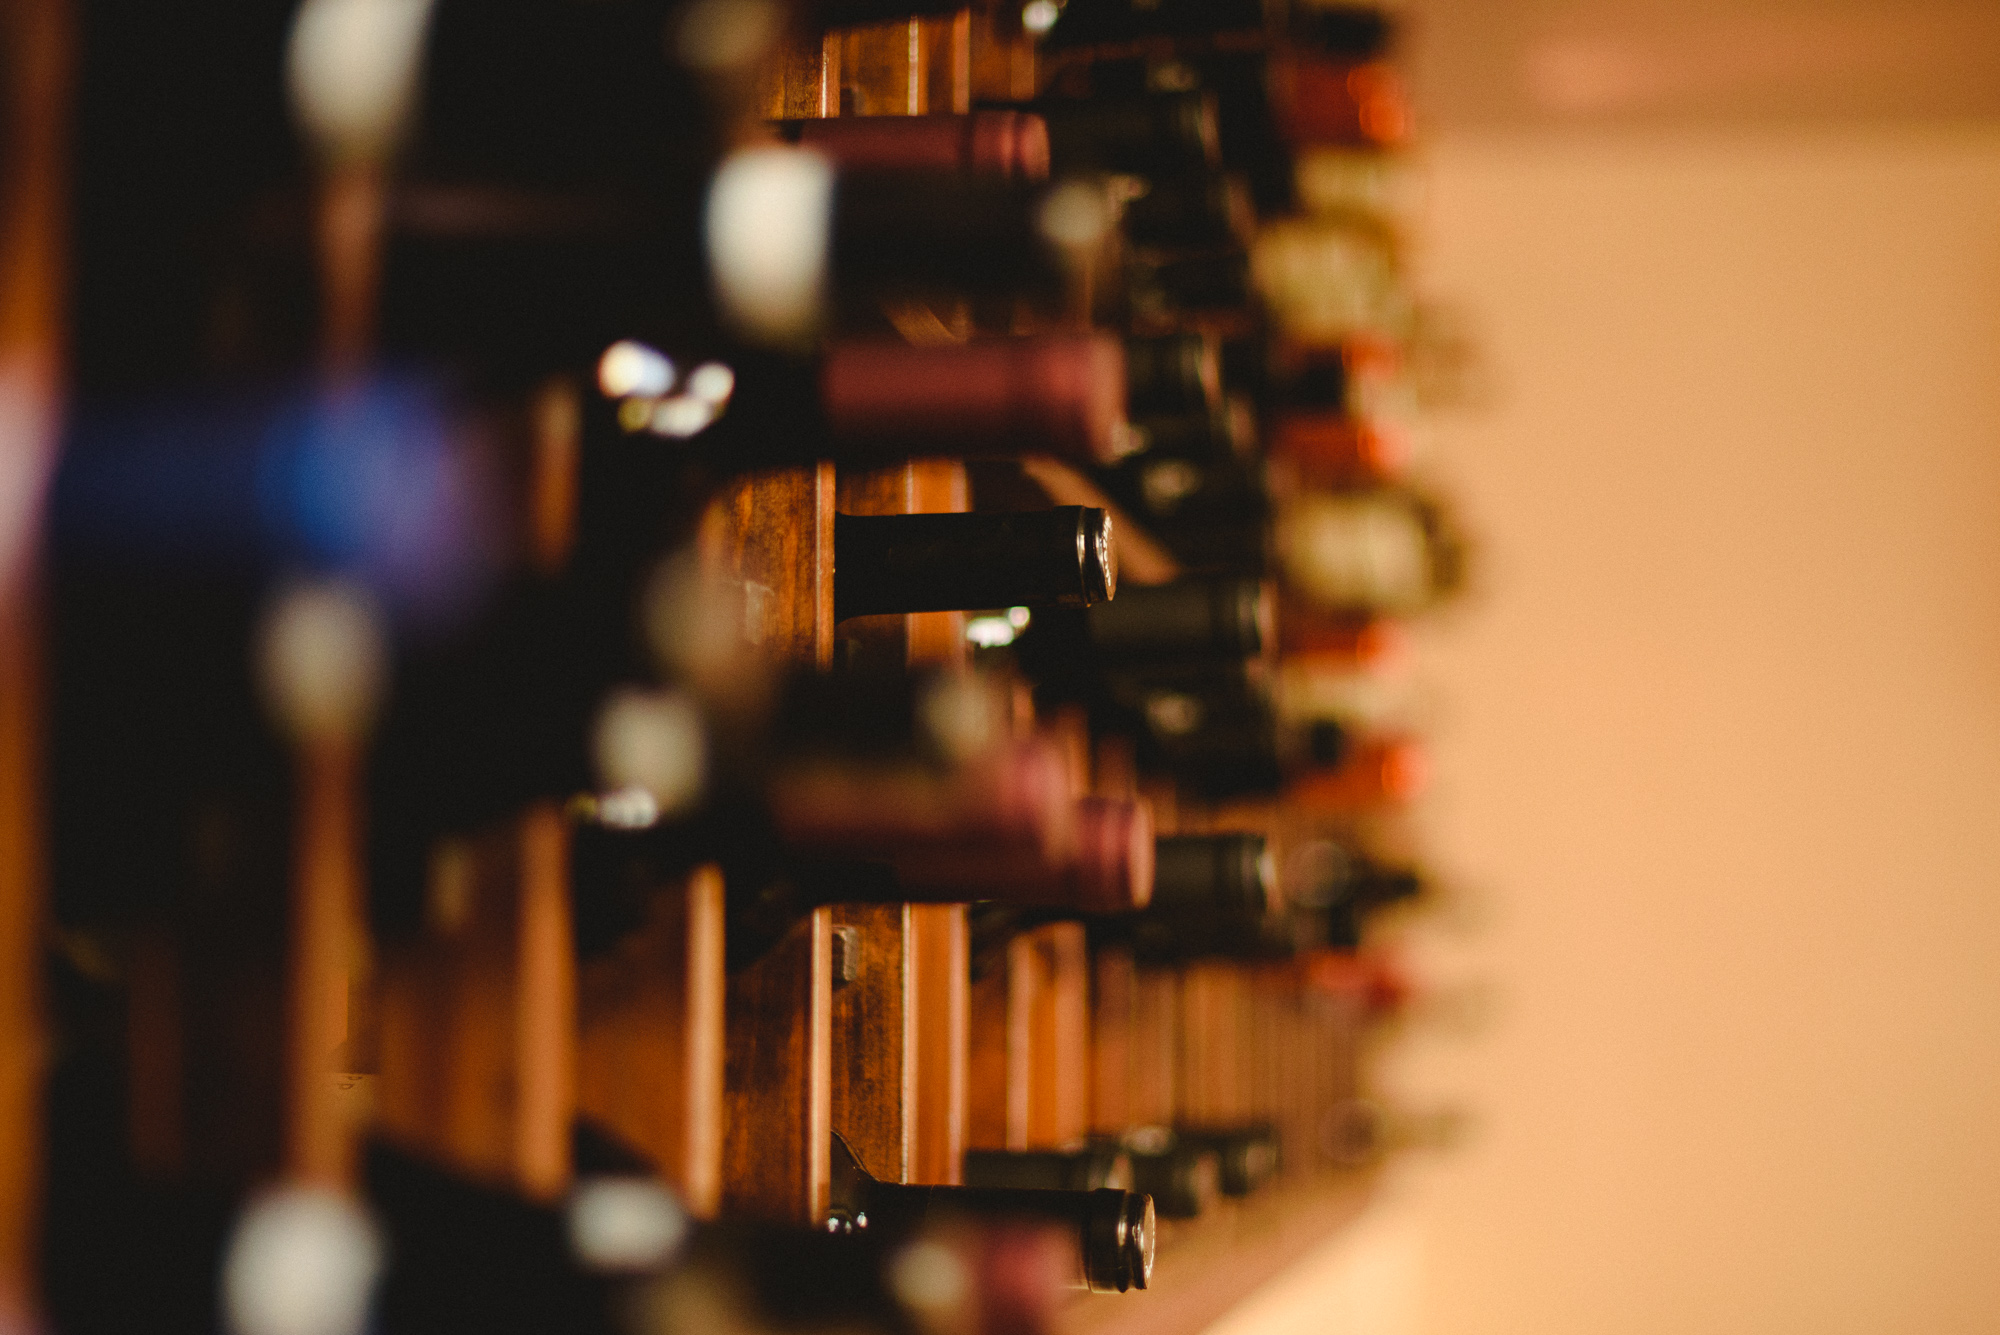 A-Tavola-Trattoria-New-Paltz-Hudson-Valley-NY-Best-Italian-Restaurant-133.jpg